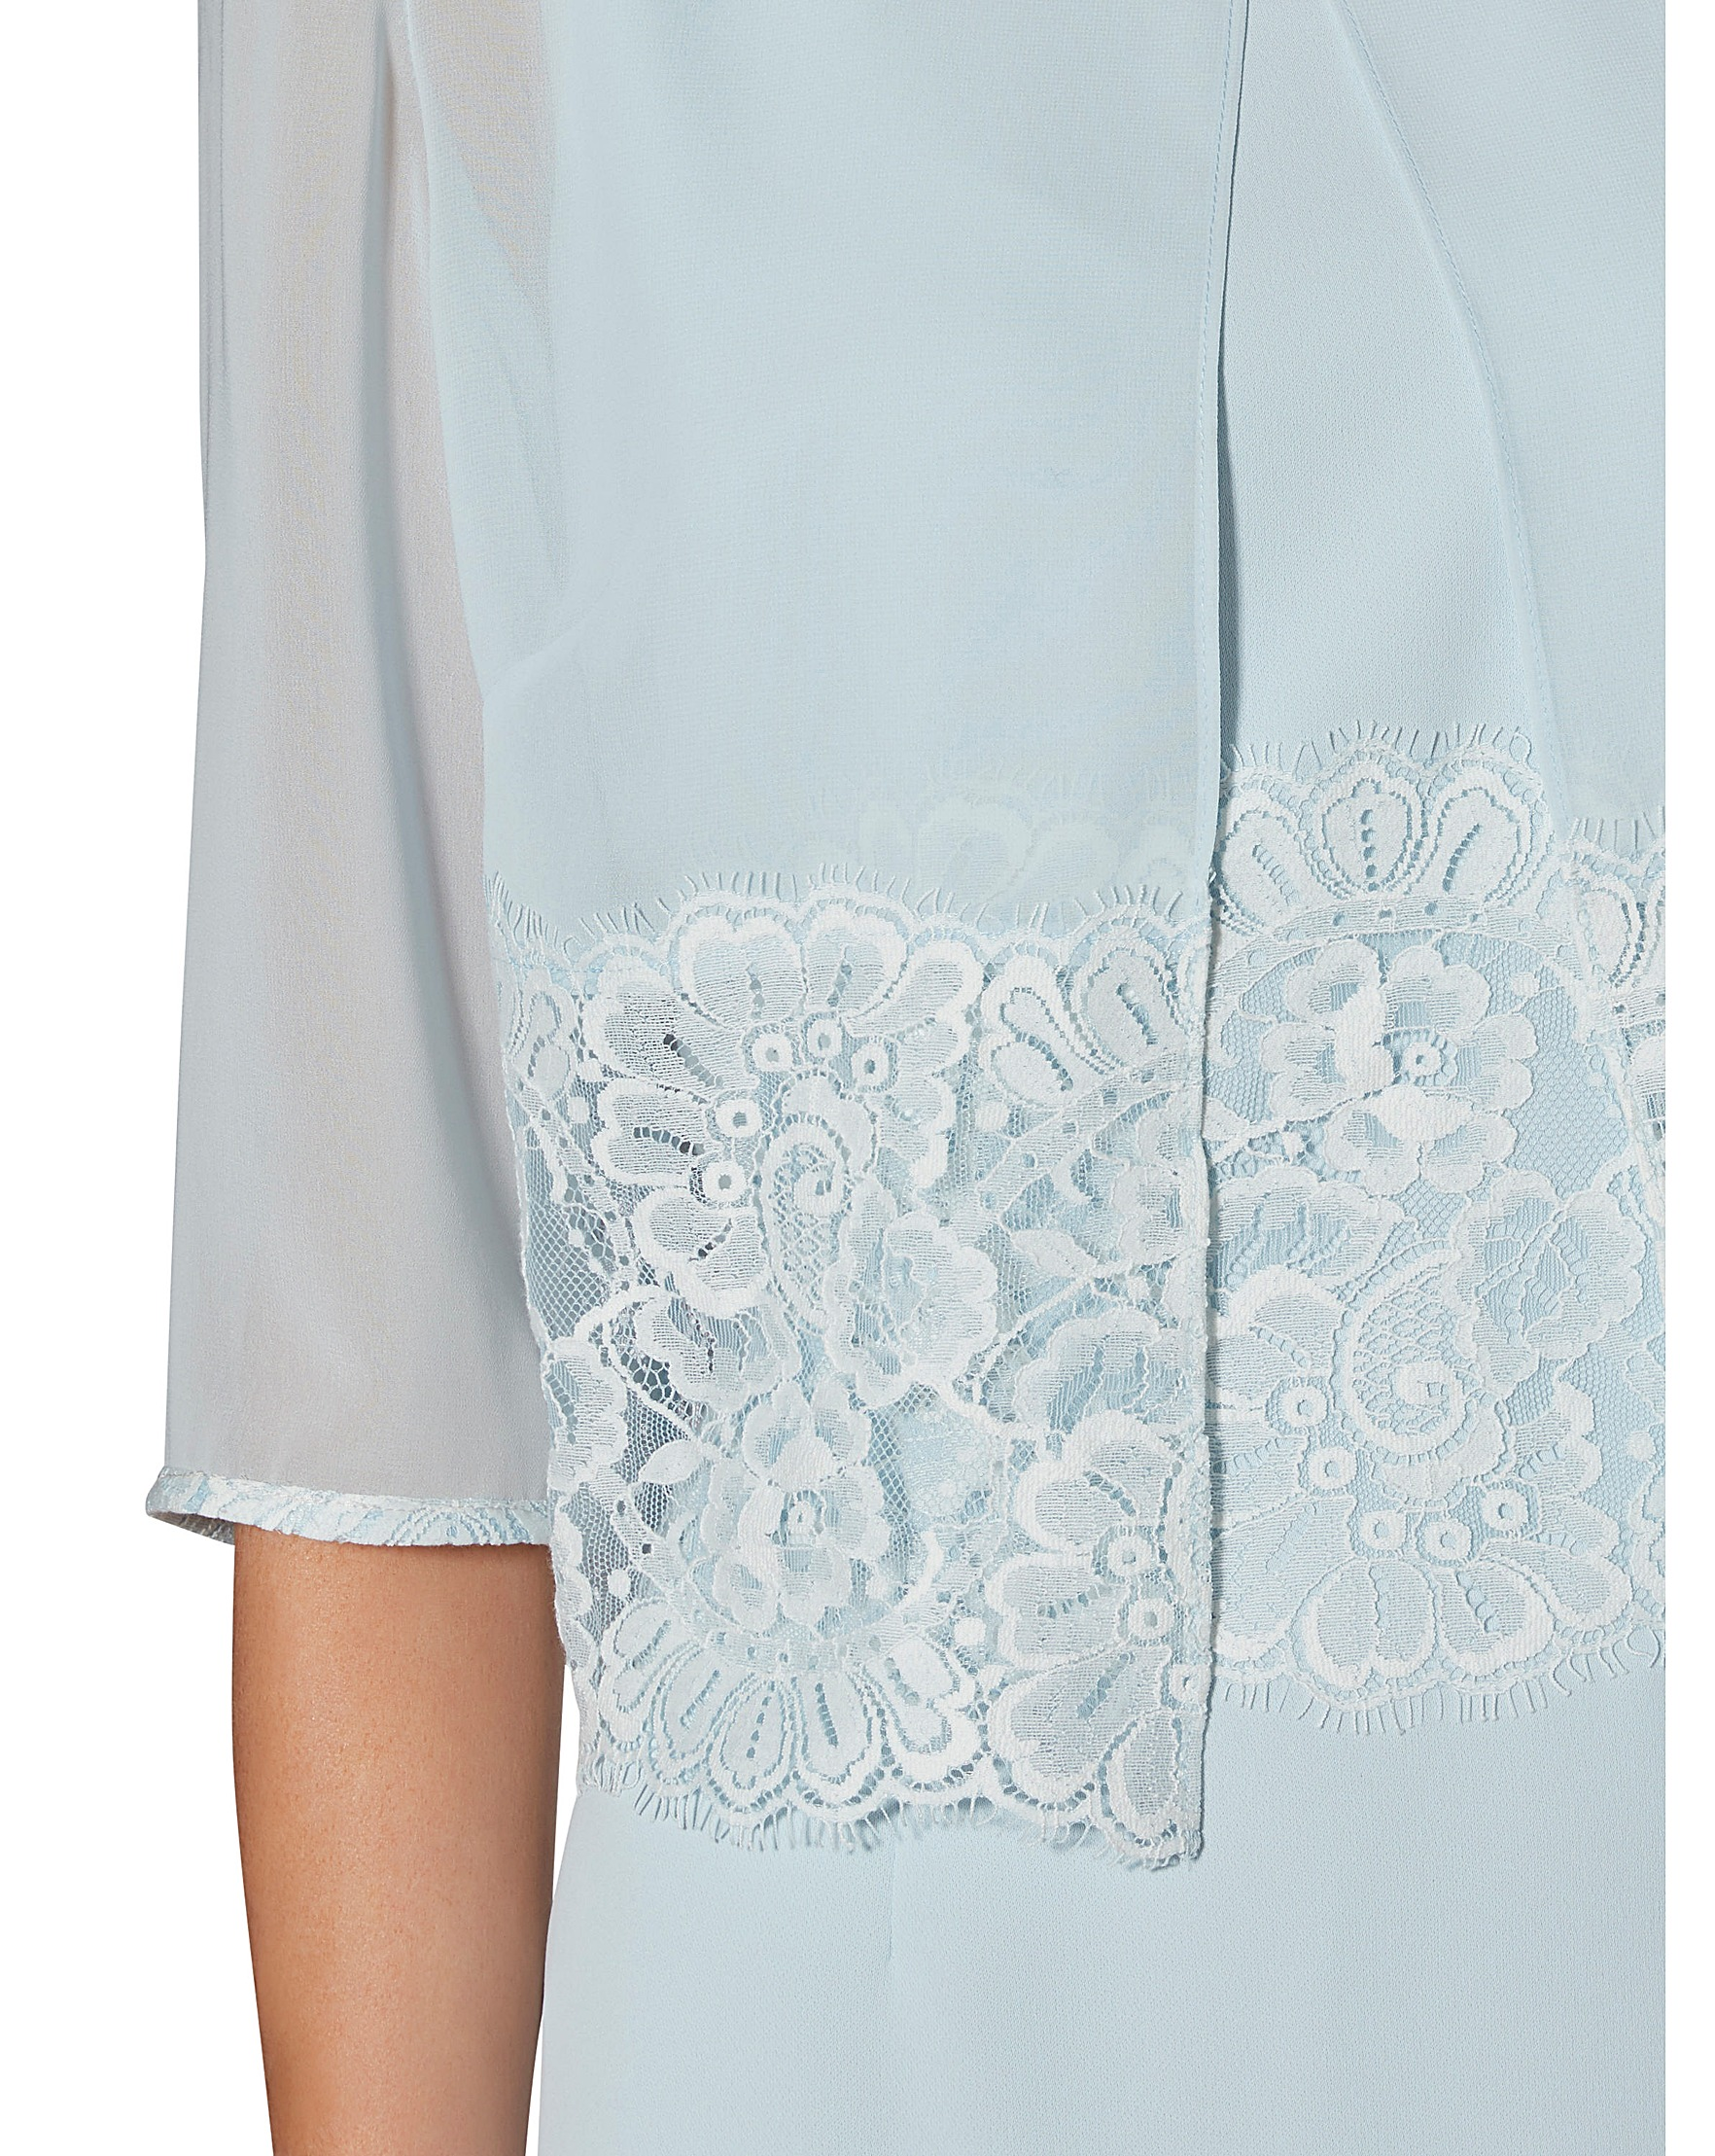 Gina Bacconi Millie Dress And Jacket | J D Williams